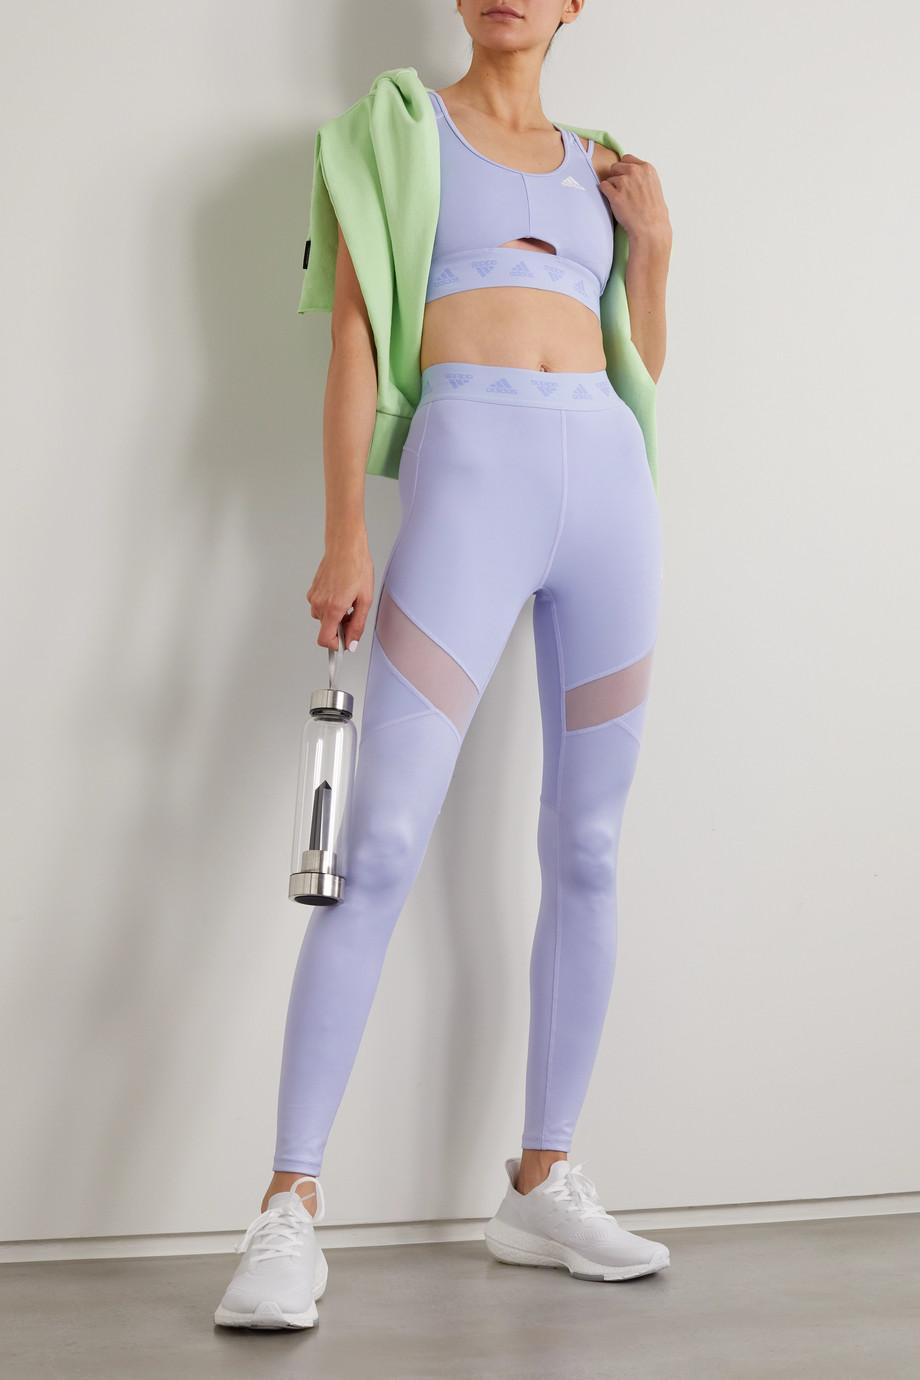 adidas Originals Hyperglam mesh-paneled stretch leggings